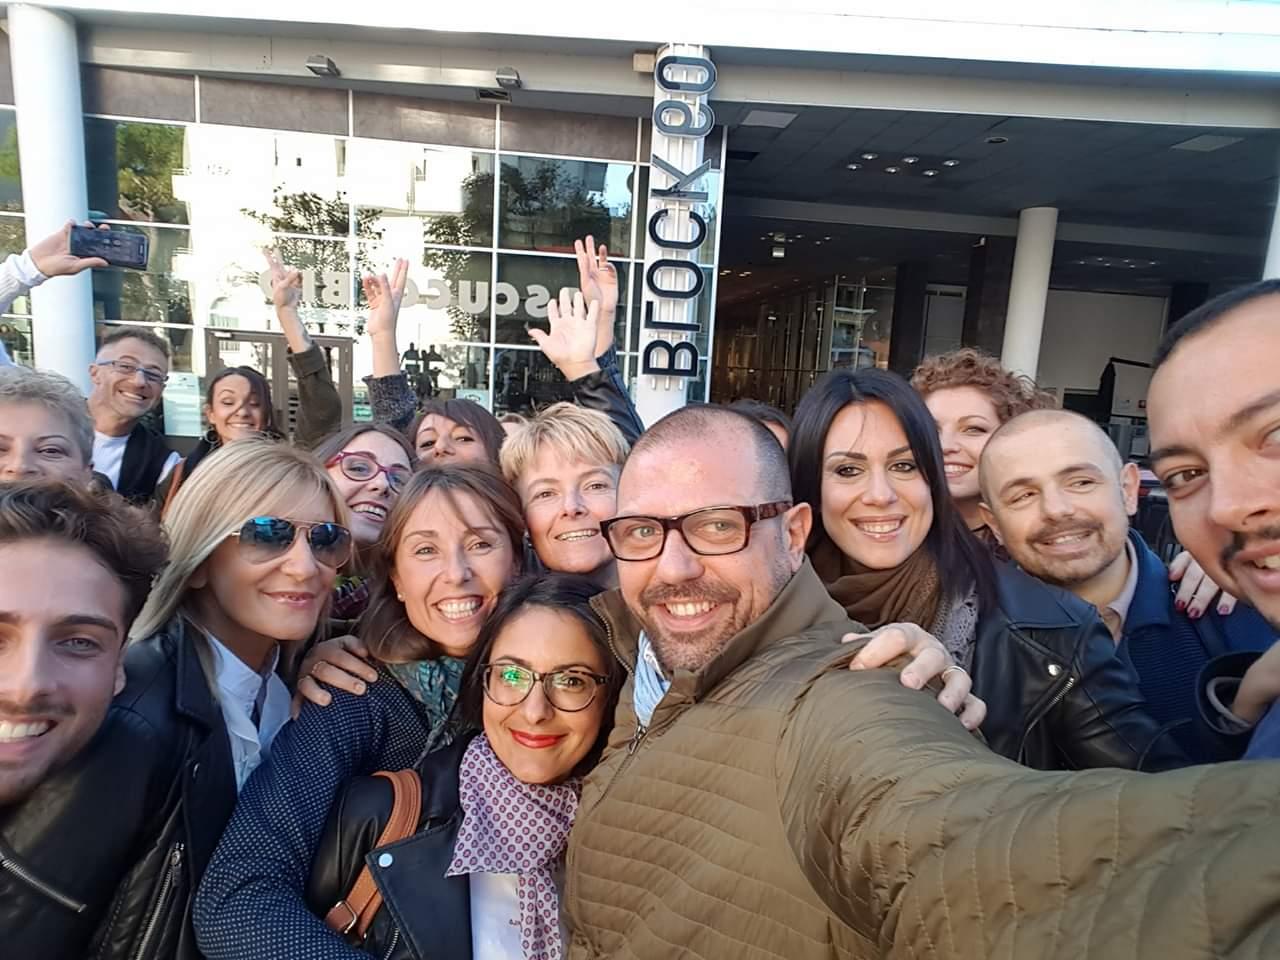 Duolife_2019_corrado_cavarra_networker_sicilia_italia2